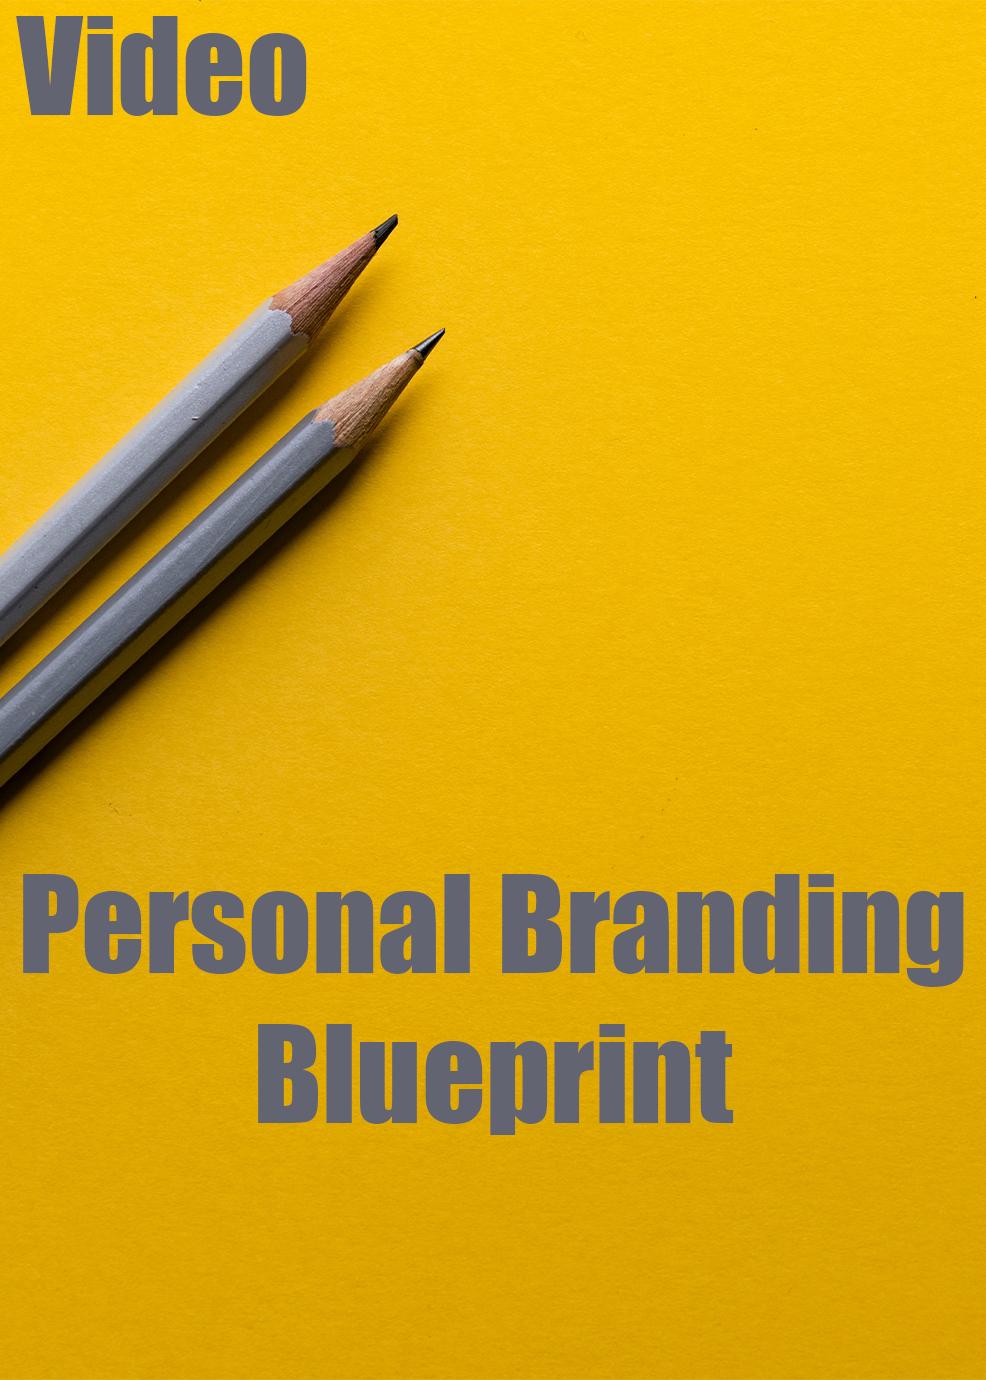 Personal Branding Blueprint Video Upgrade